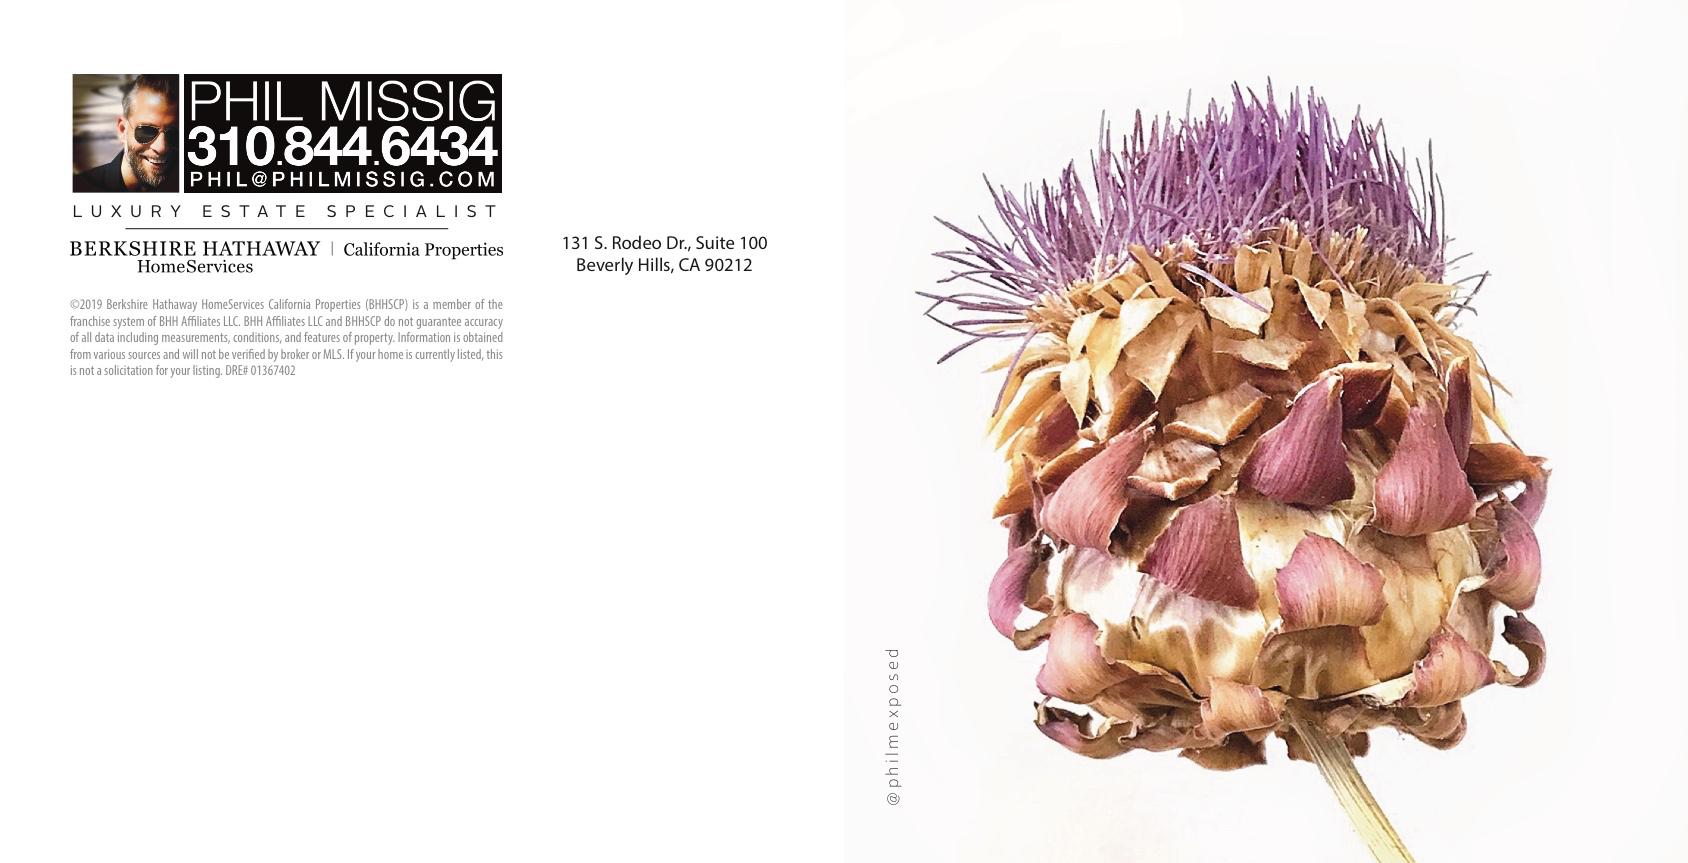 postcard - Phil Missig - SOLD 104percent - Cover.jpg